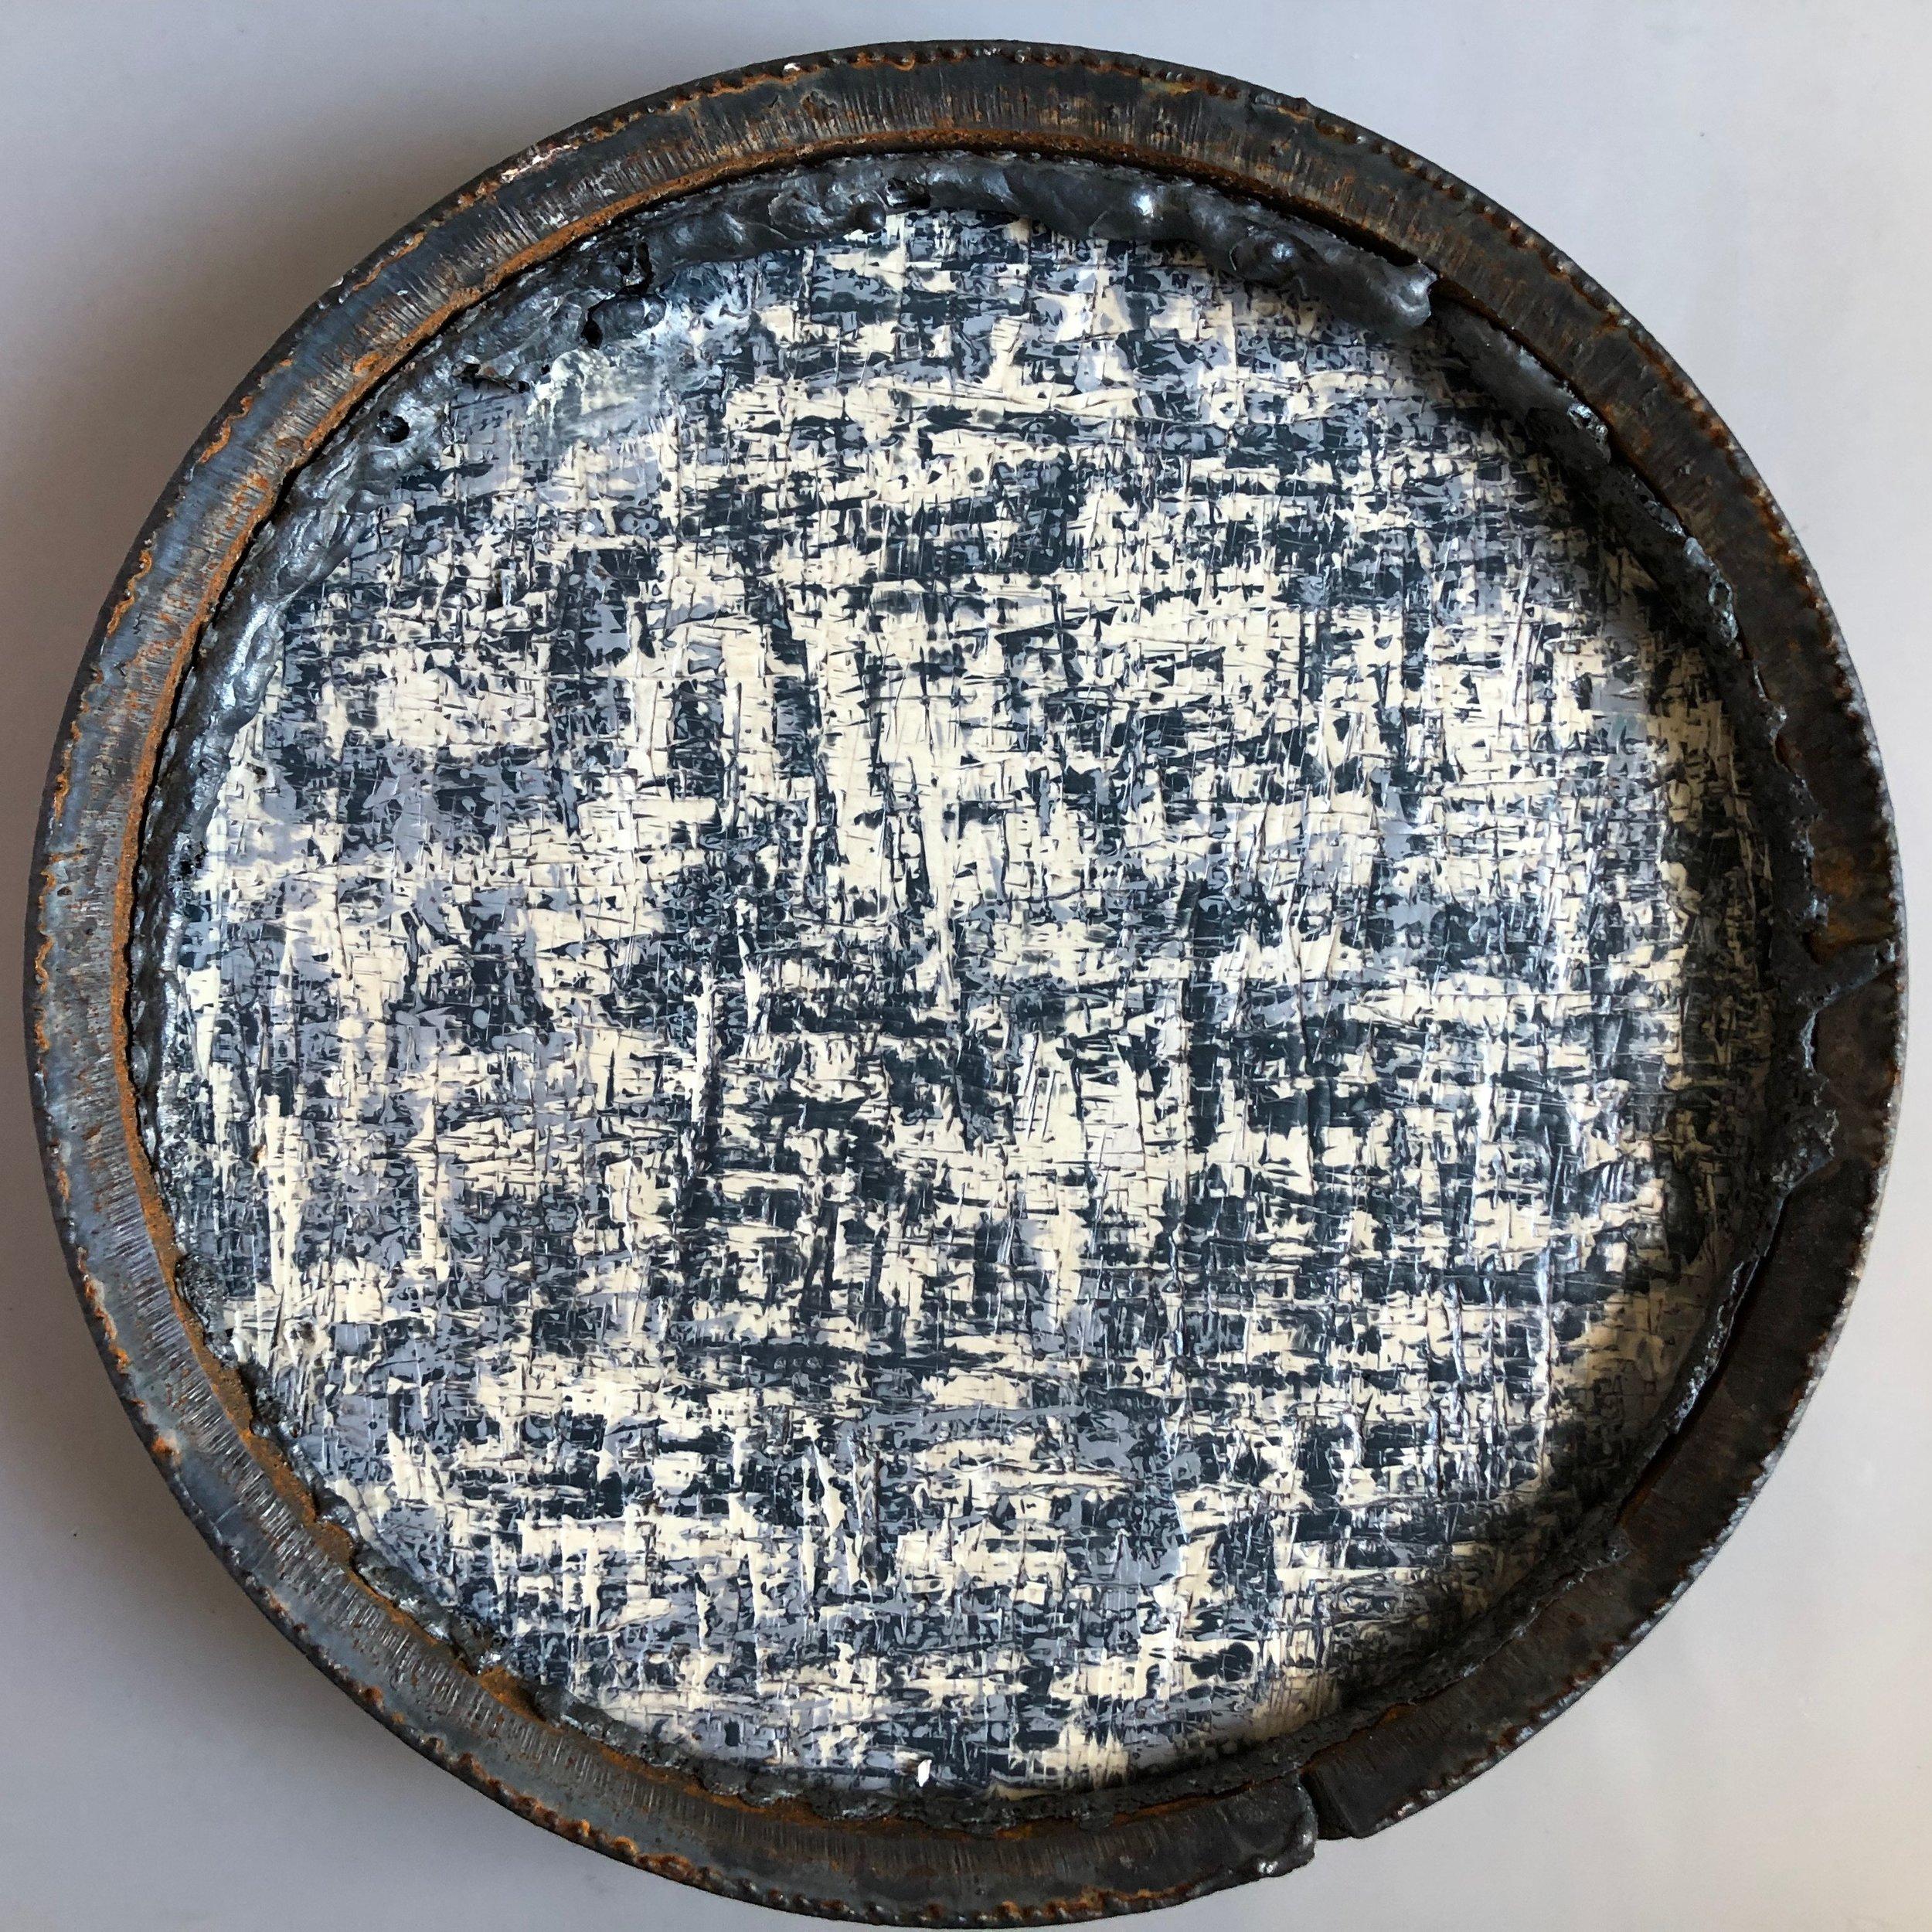 Circular Economy 1 - Found metal and encaustic on birch wood panel12